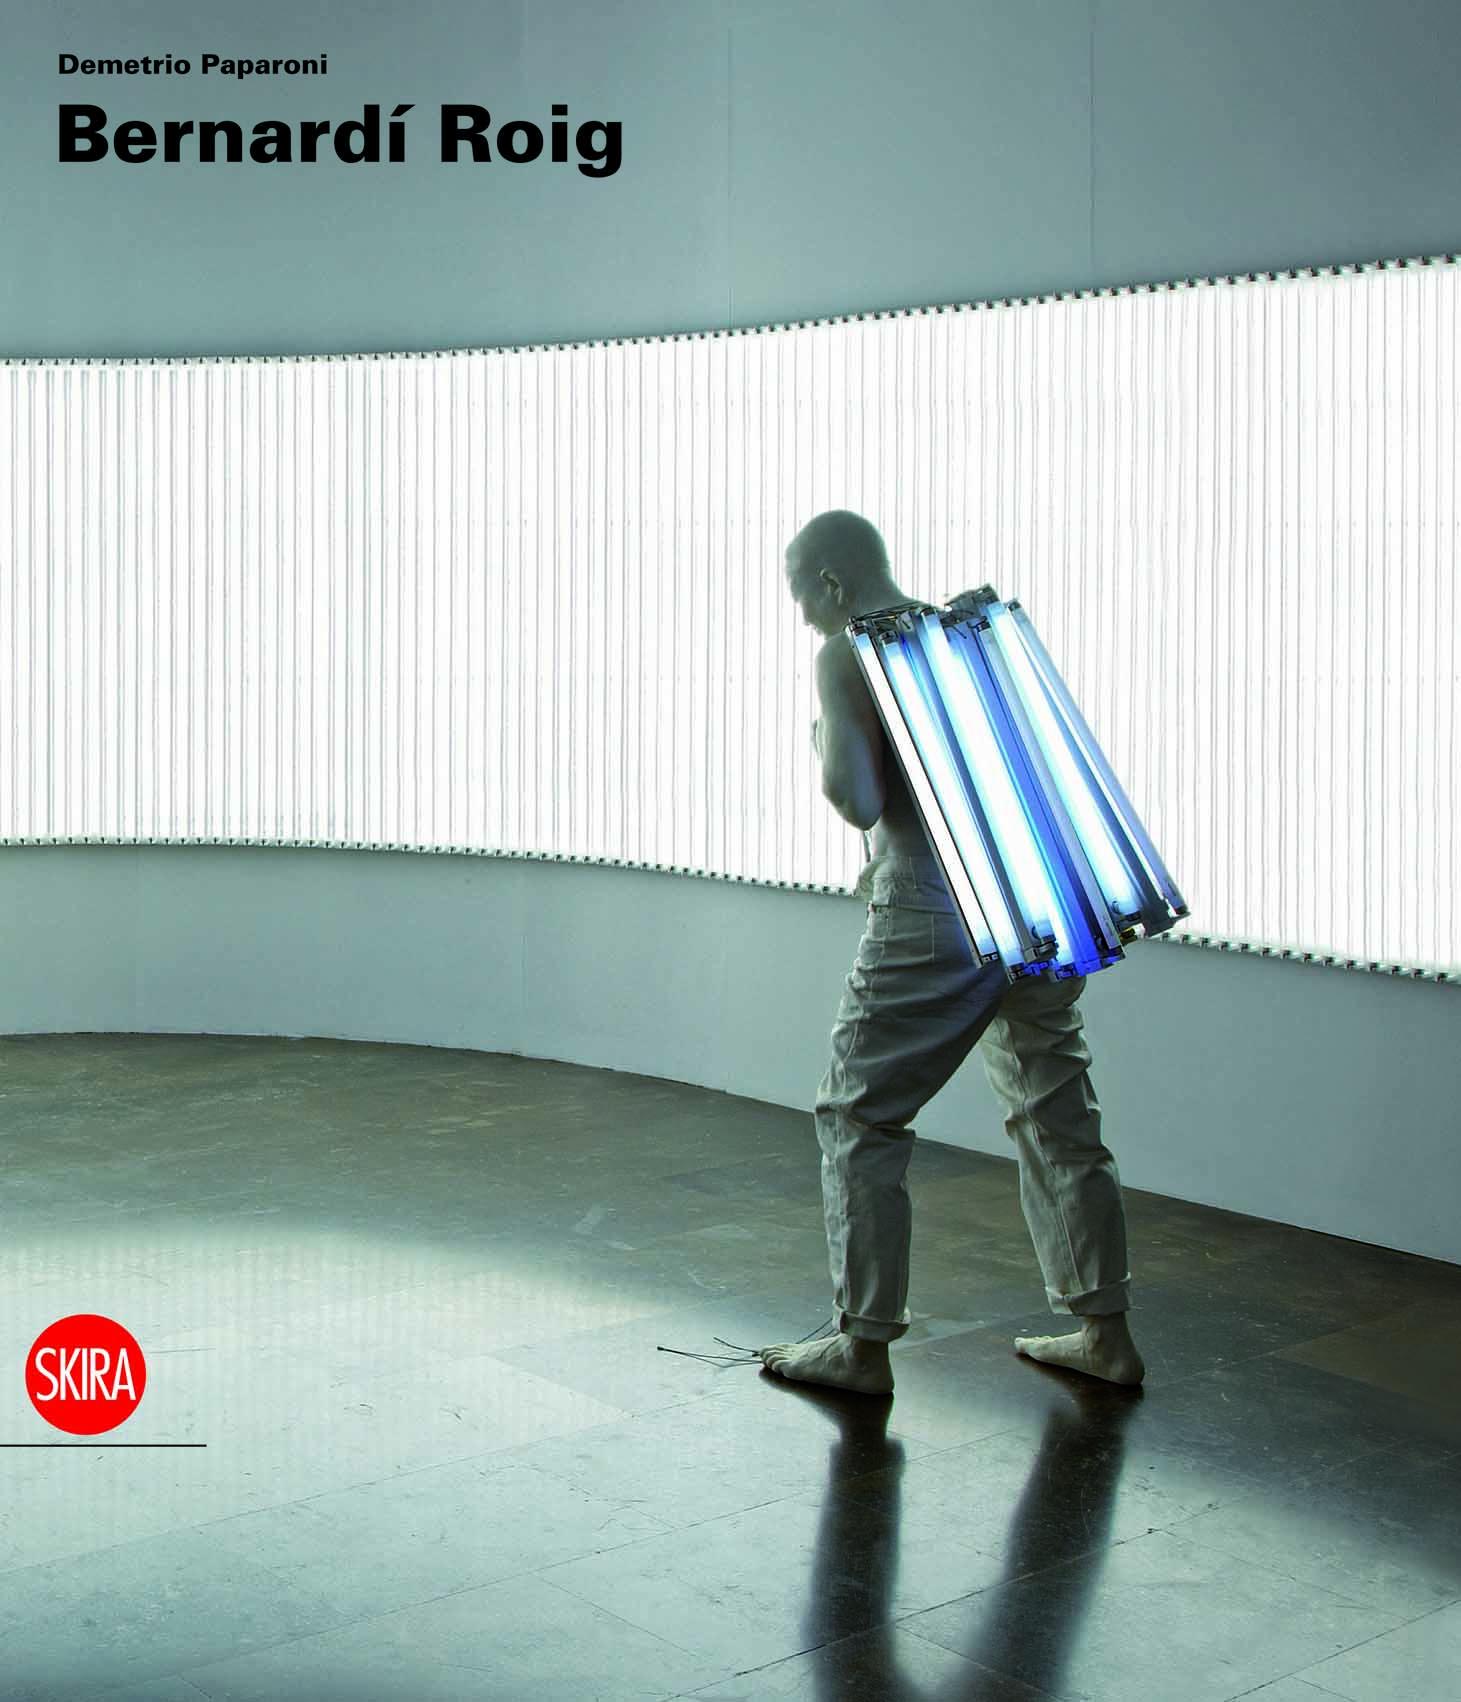 BERNARDI ROIG / Skira 2009